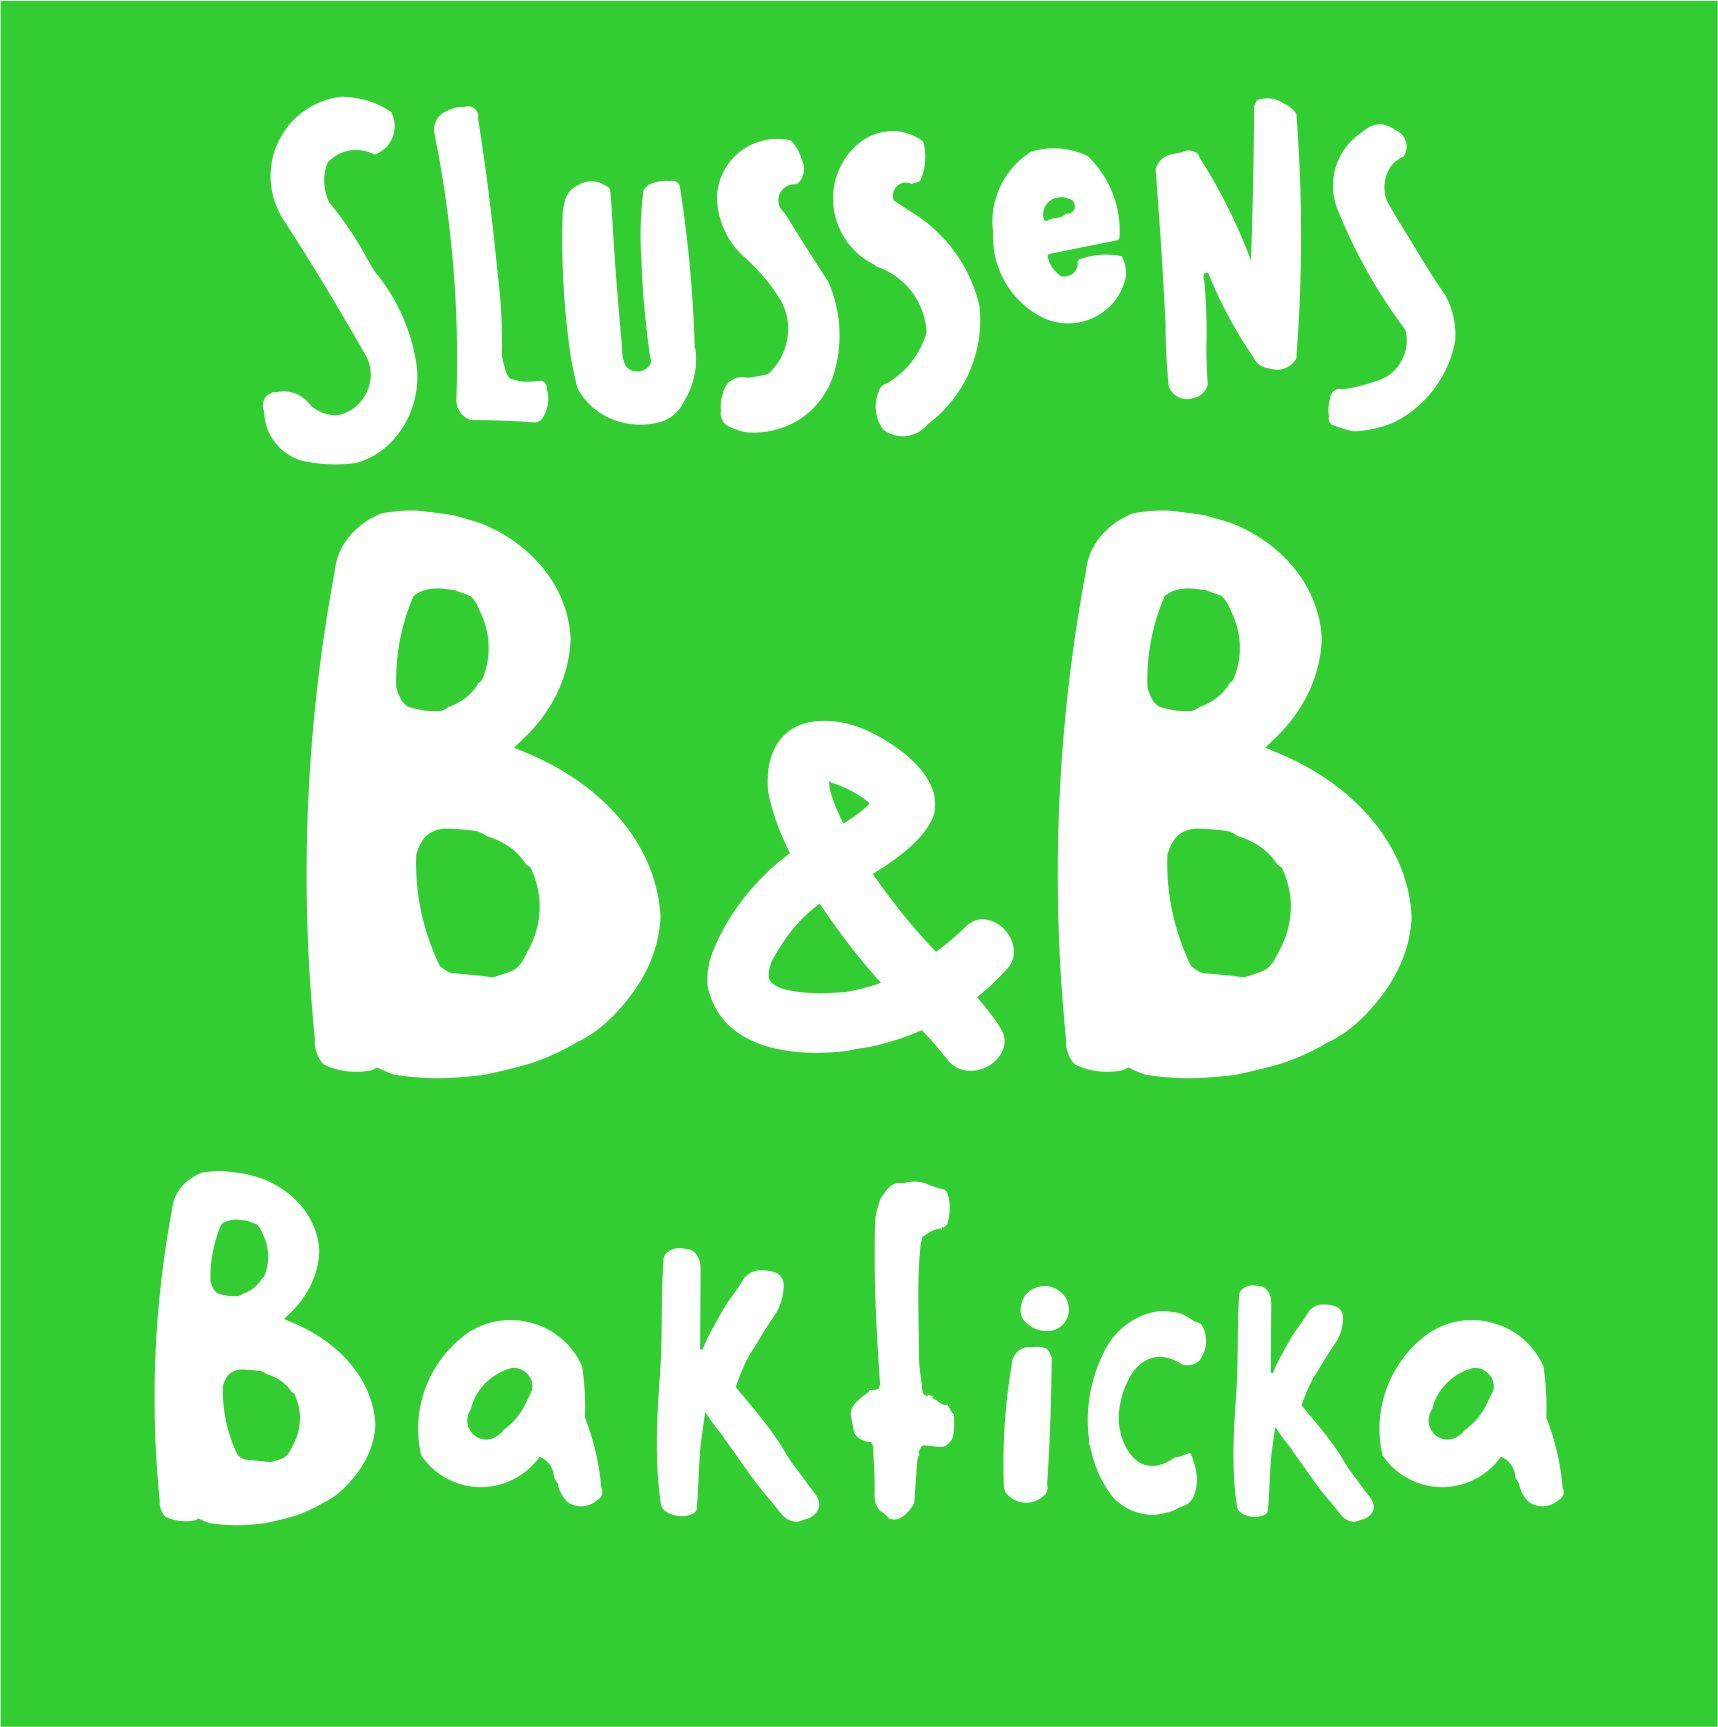 Slussens Bakficka B & B